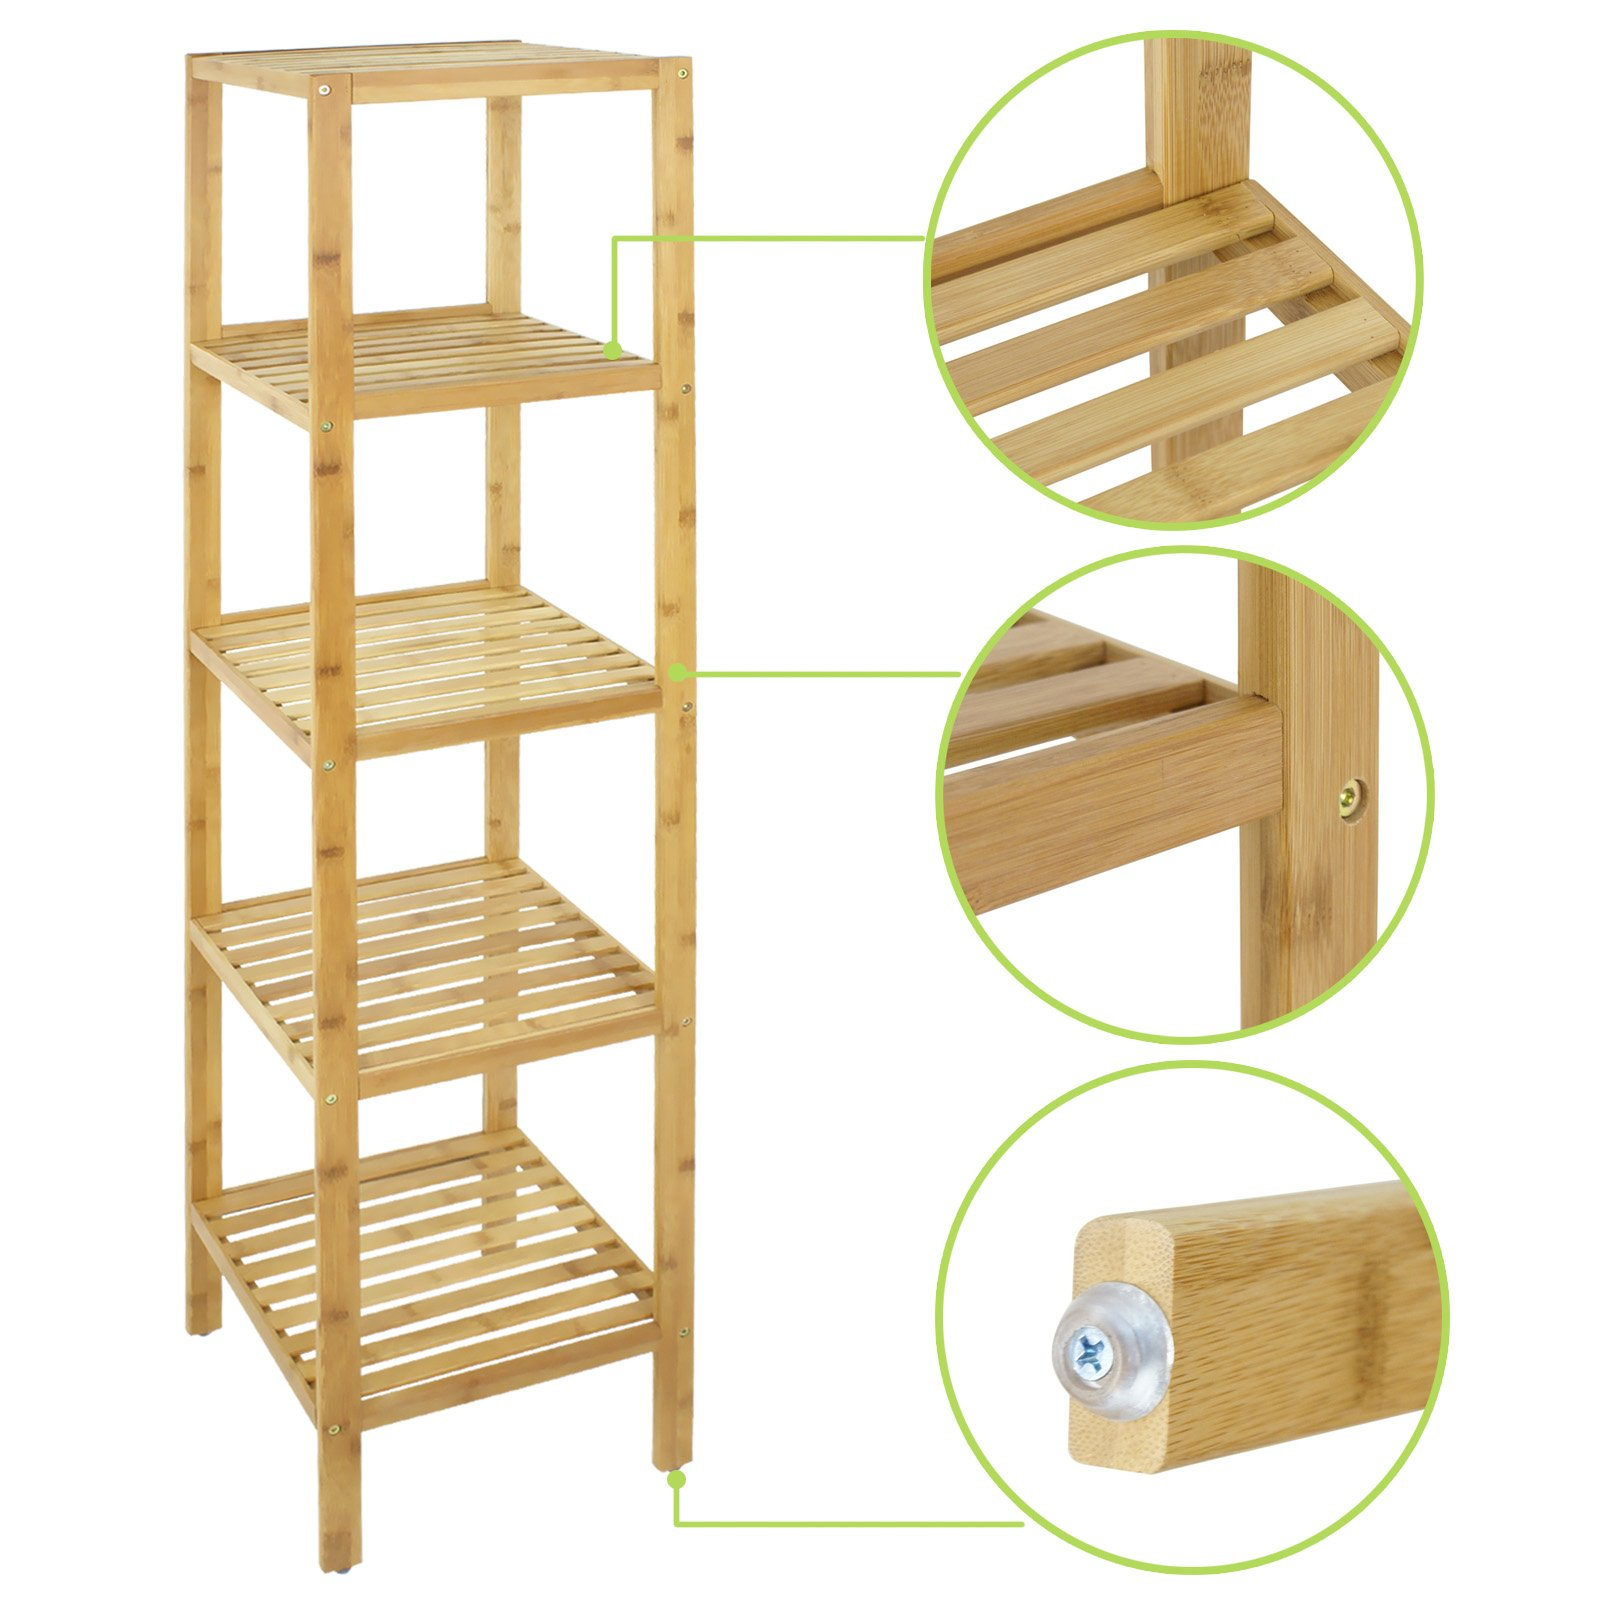 Smartxchoices 5 Tier 100% Bamboo Bathroom Organizer Standing Shelf Towel Rack Free Standing Shelves Units Wood Storage Rack Corner Bookshelf Plant Stand (57.5'' H)